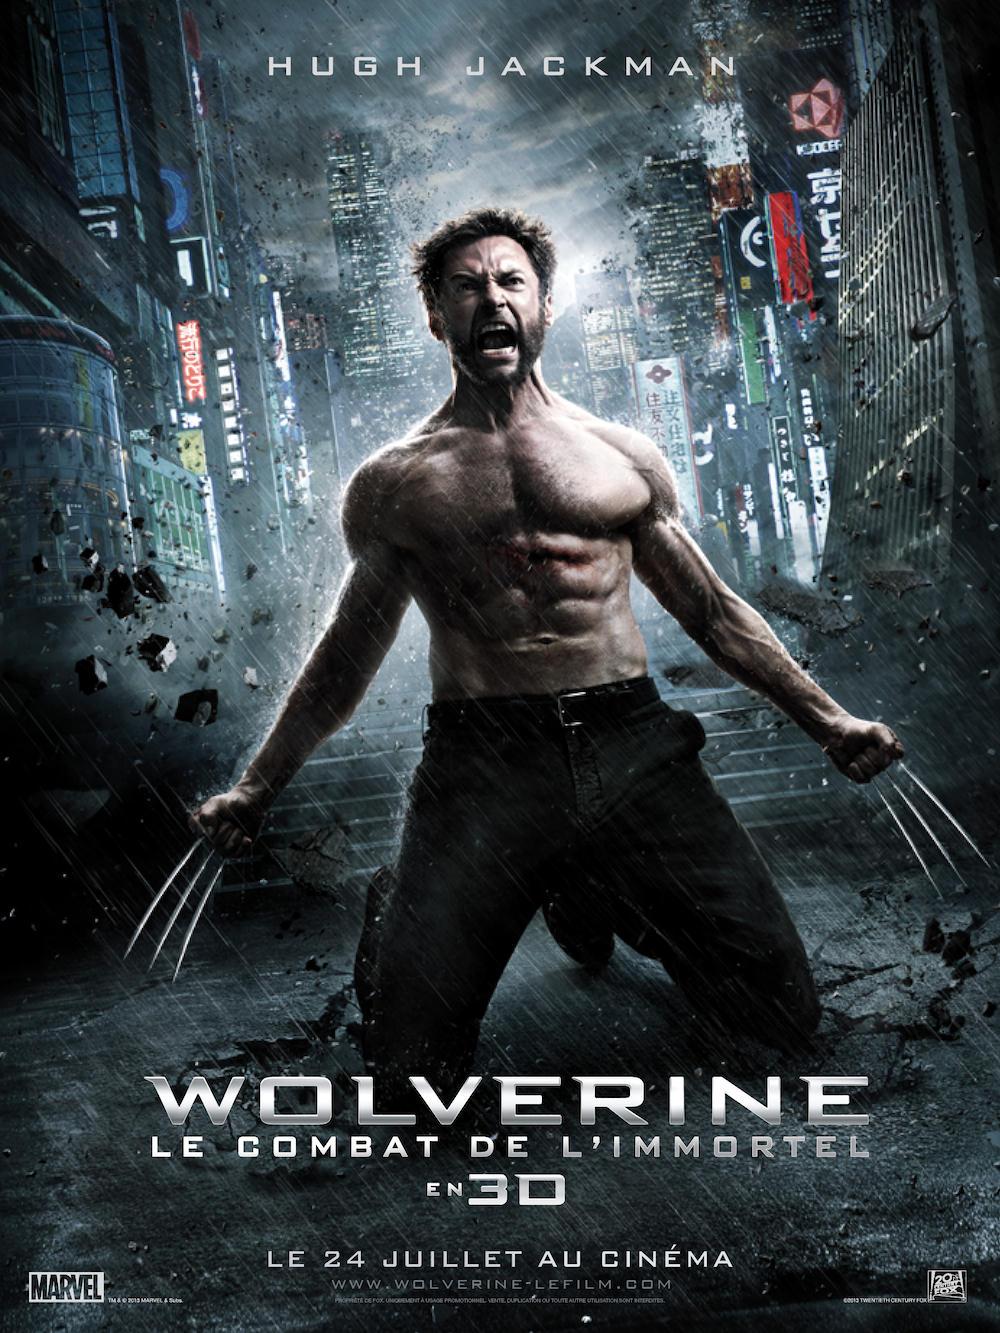 Wolverine combat immortel mangold